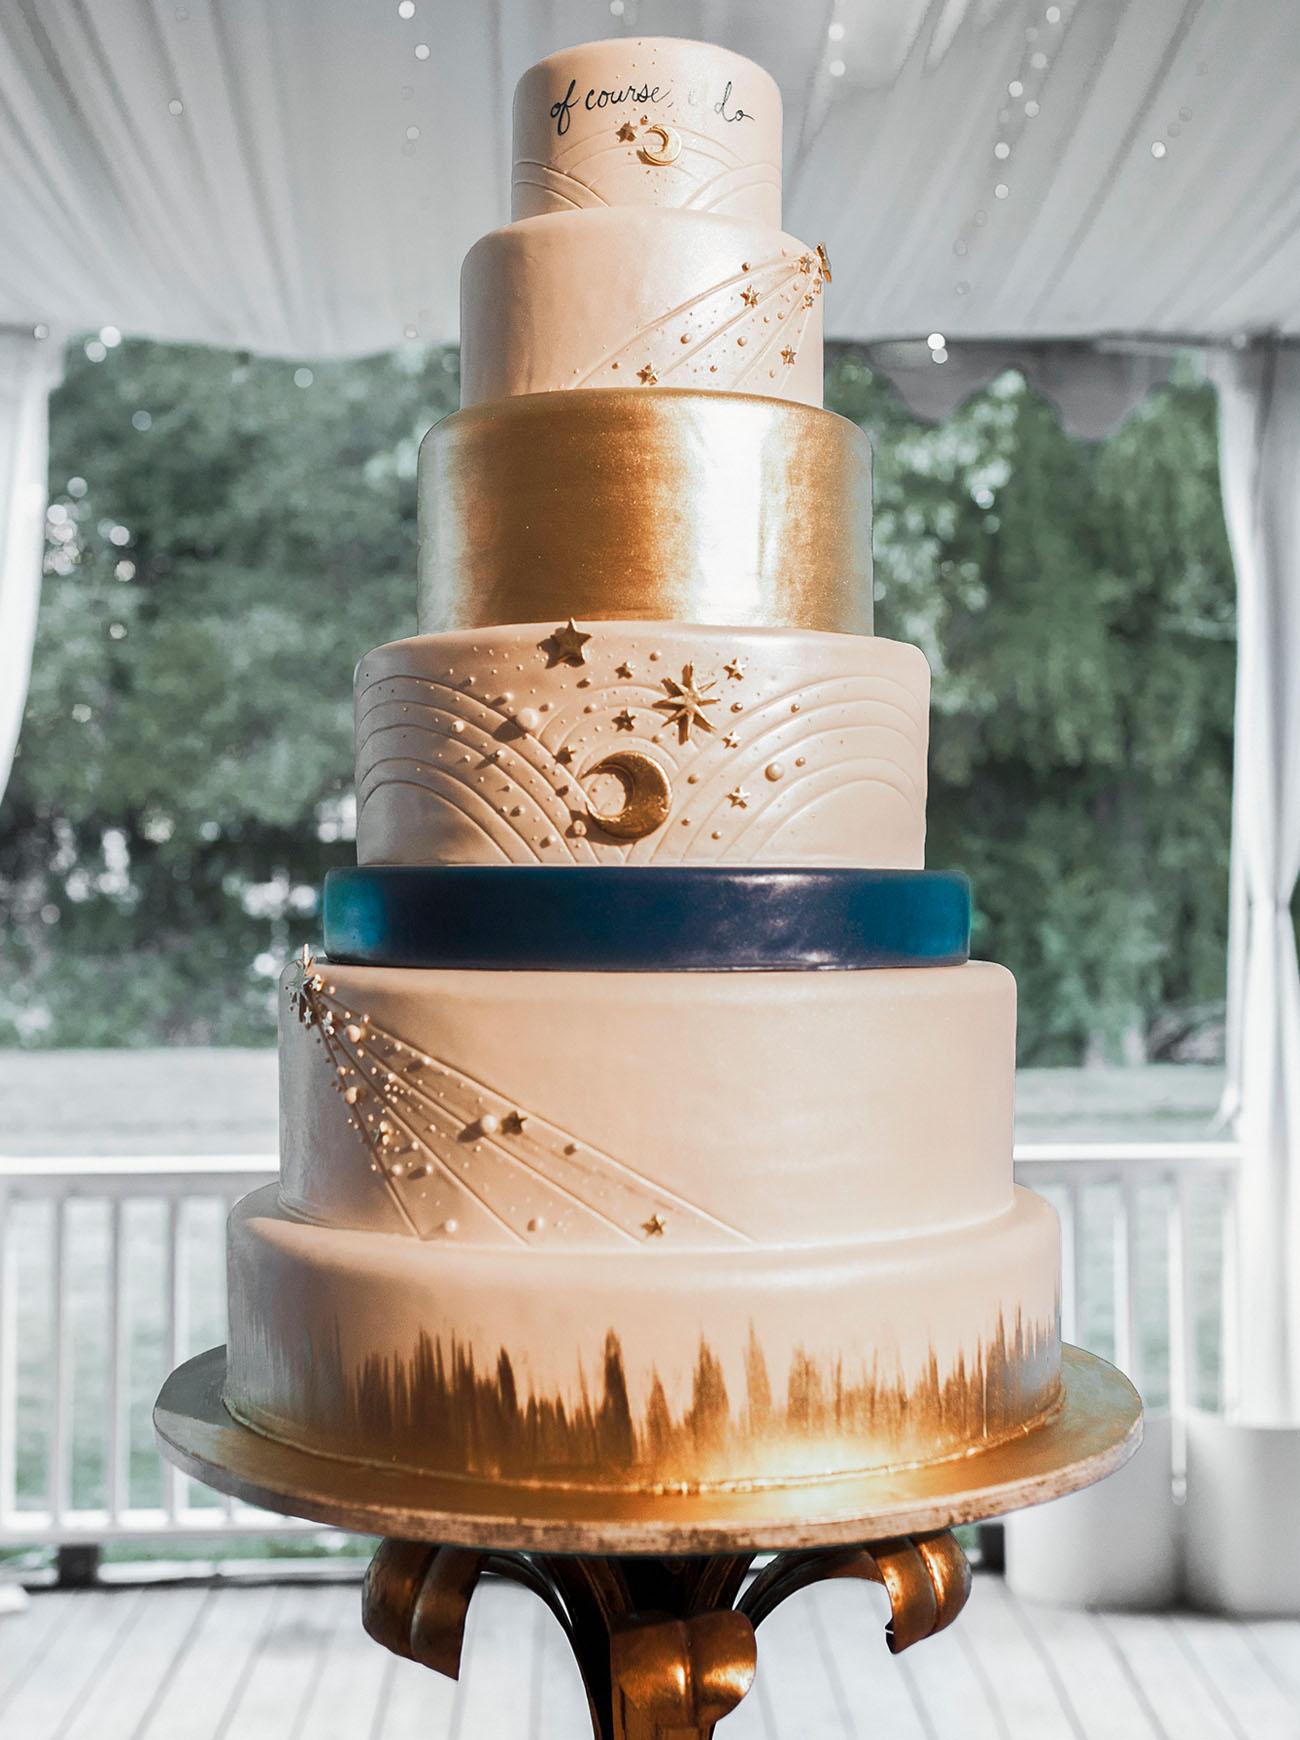 celestial wedding ideas 6 layer cake styling